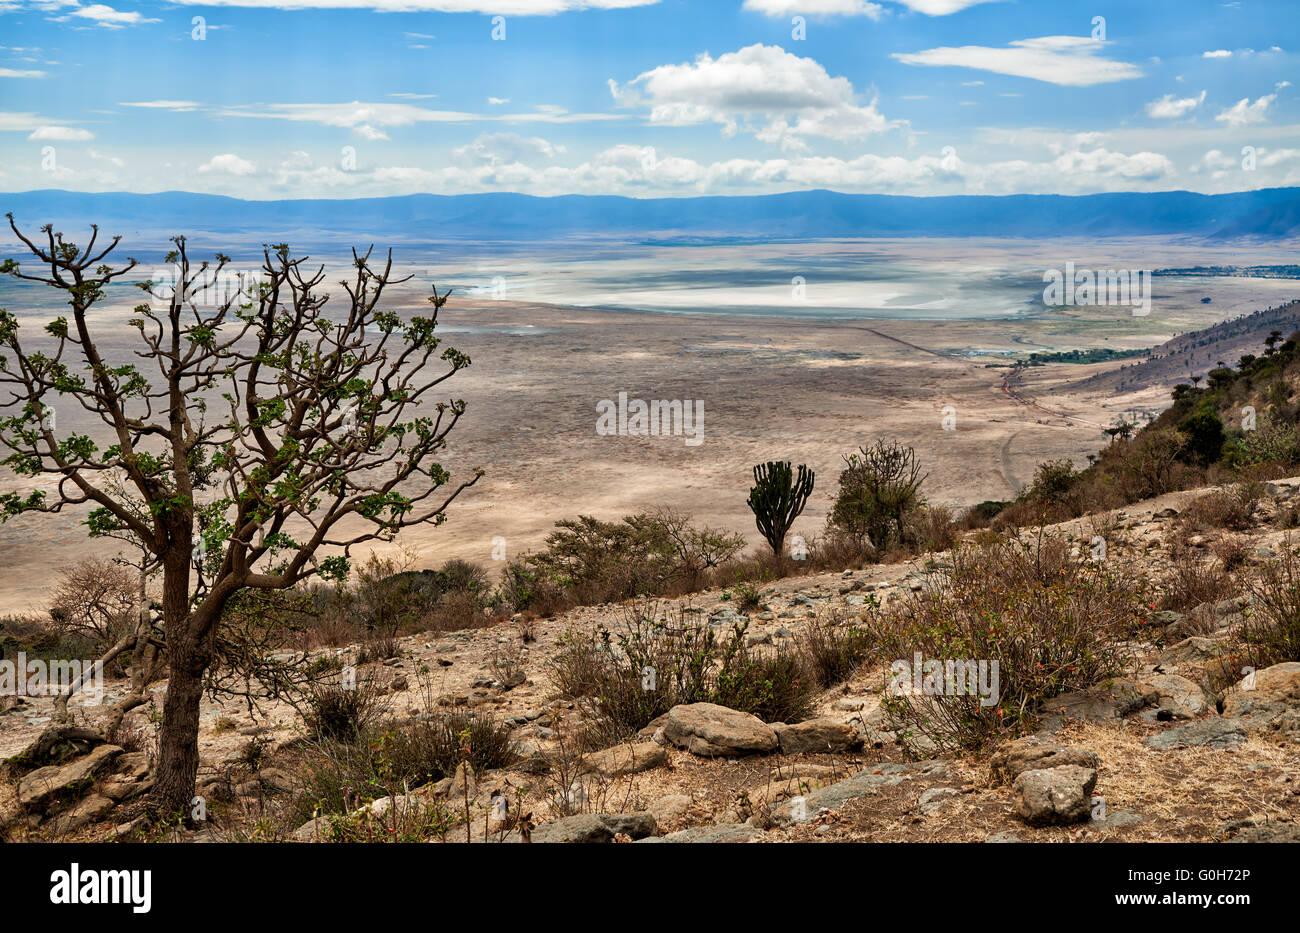 view from the rim into the Ngorongoro crater, Ngorongoro Conservation Area, UNESCO world heritage site, Tanzania, - Stock Image